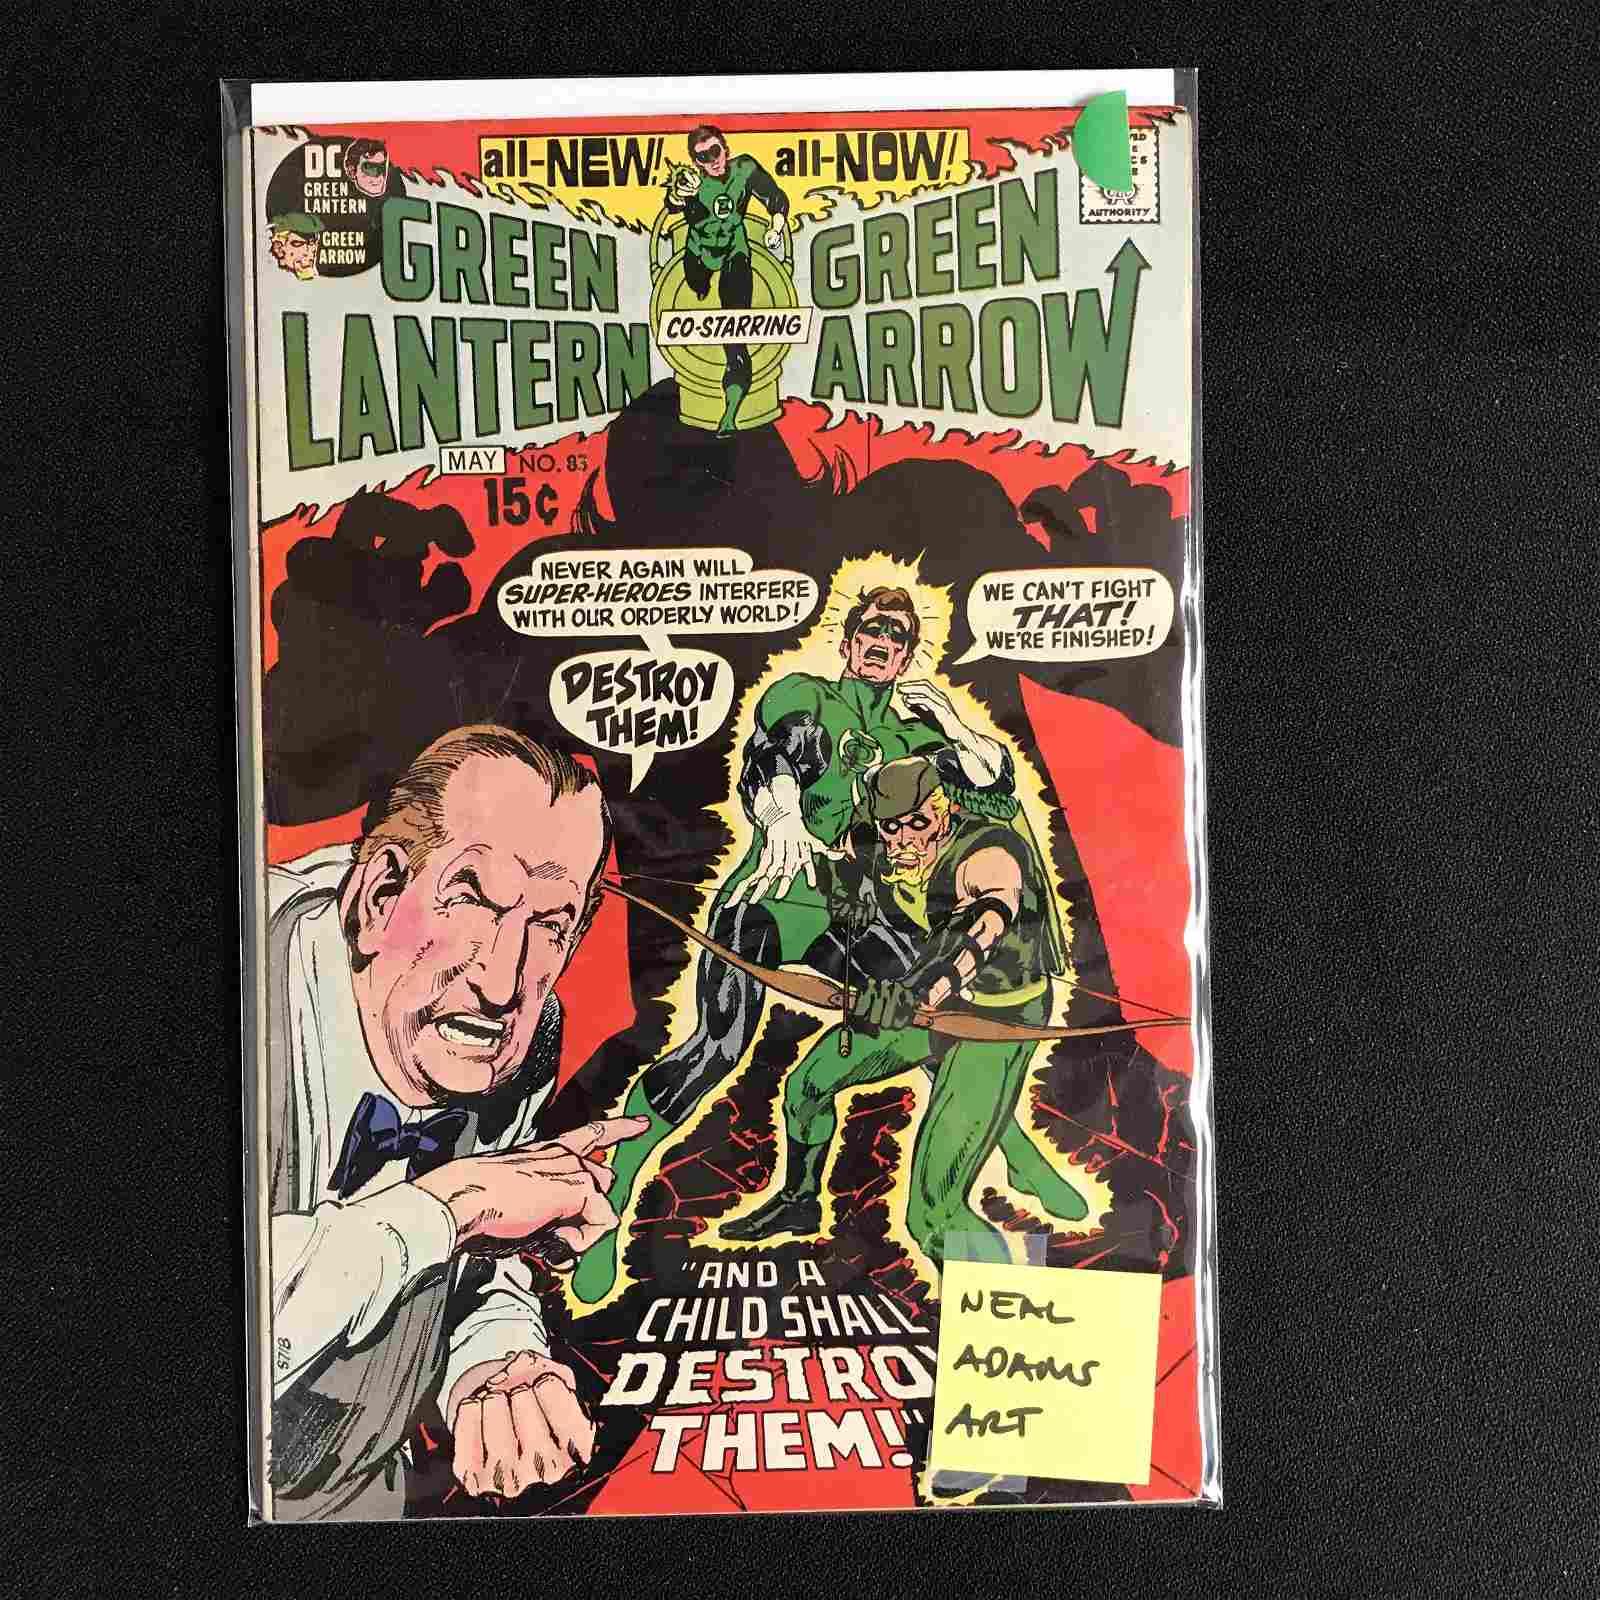 GREEN LANTERN Co-Starring GREEN ARROW #83 (DC COMICS)